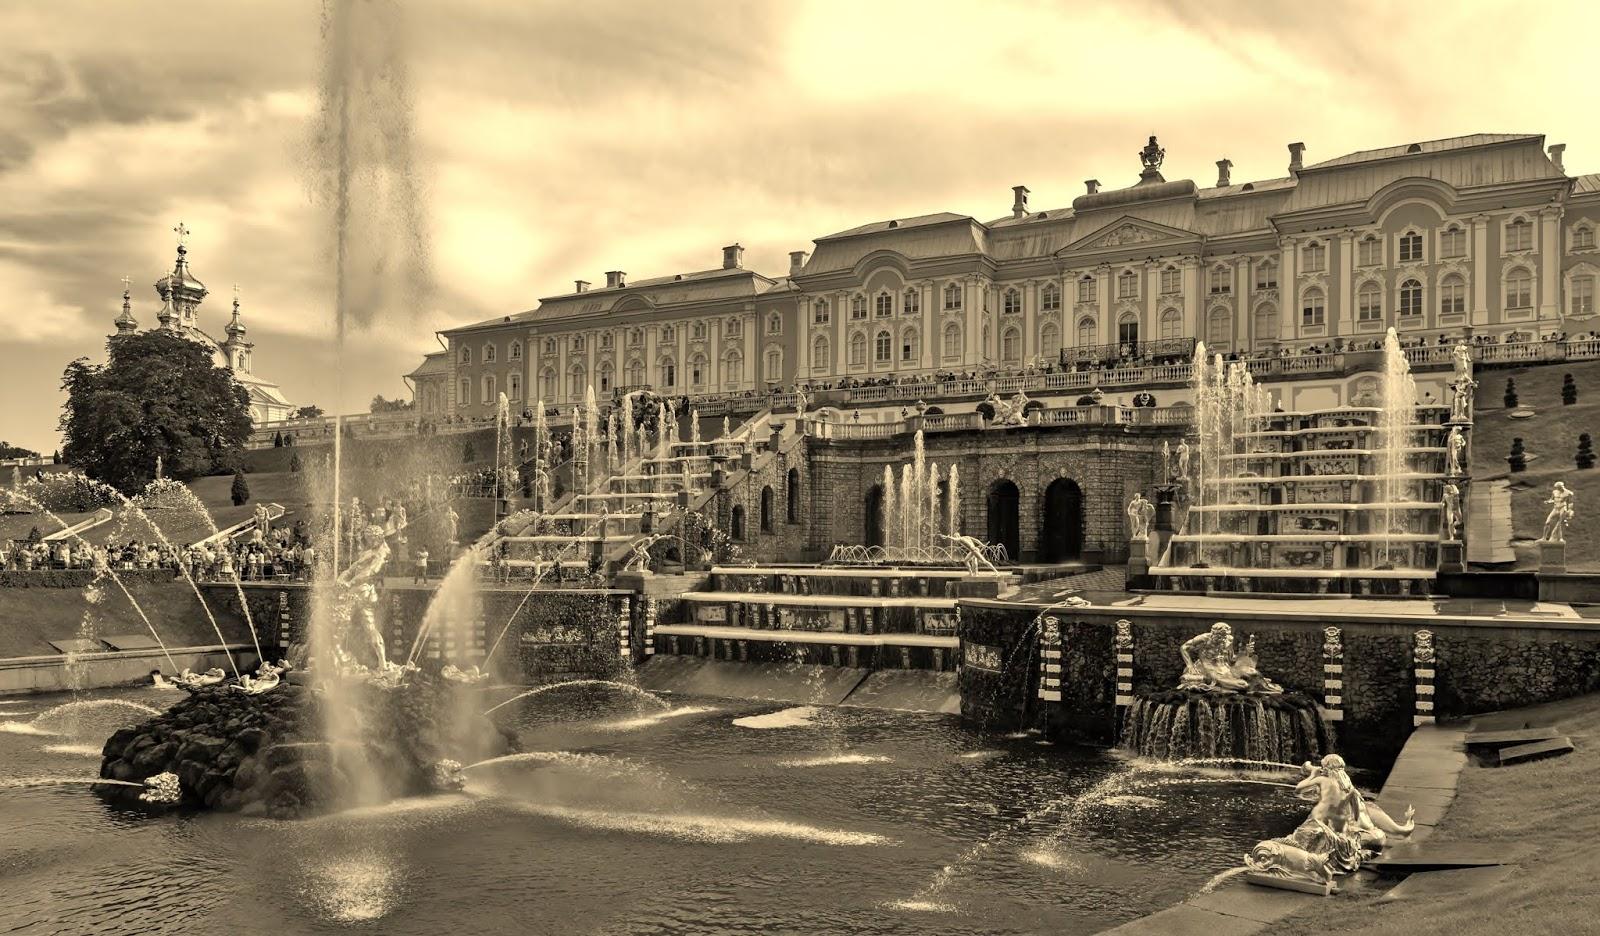 Peterhof_Palace,_Saint_Petersburg,_Russia